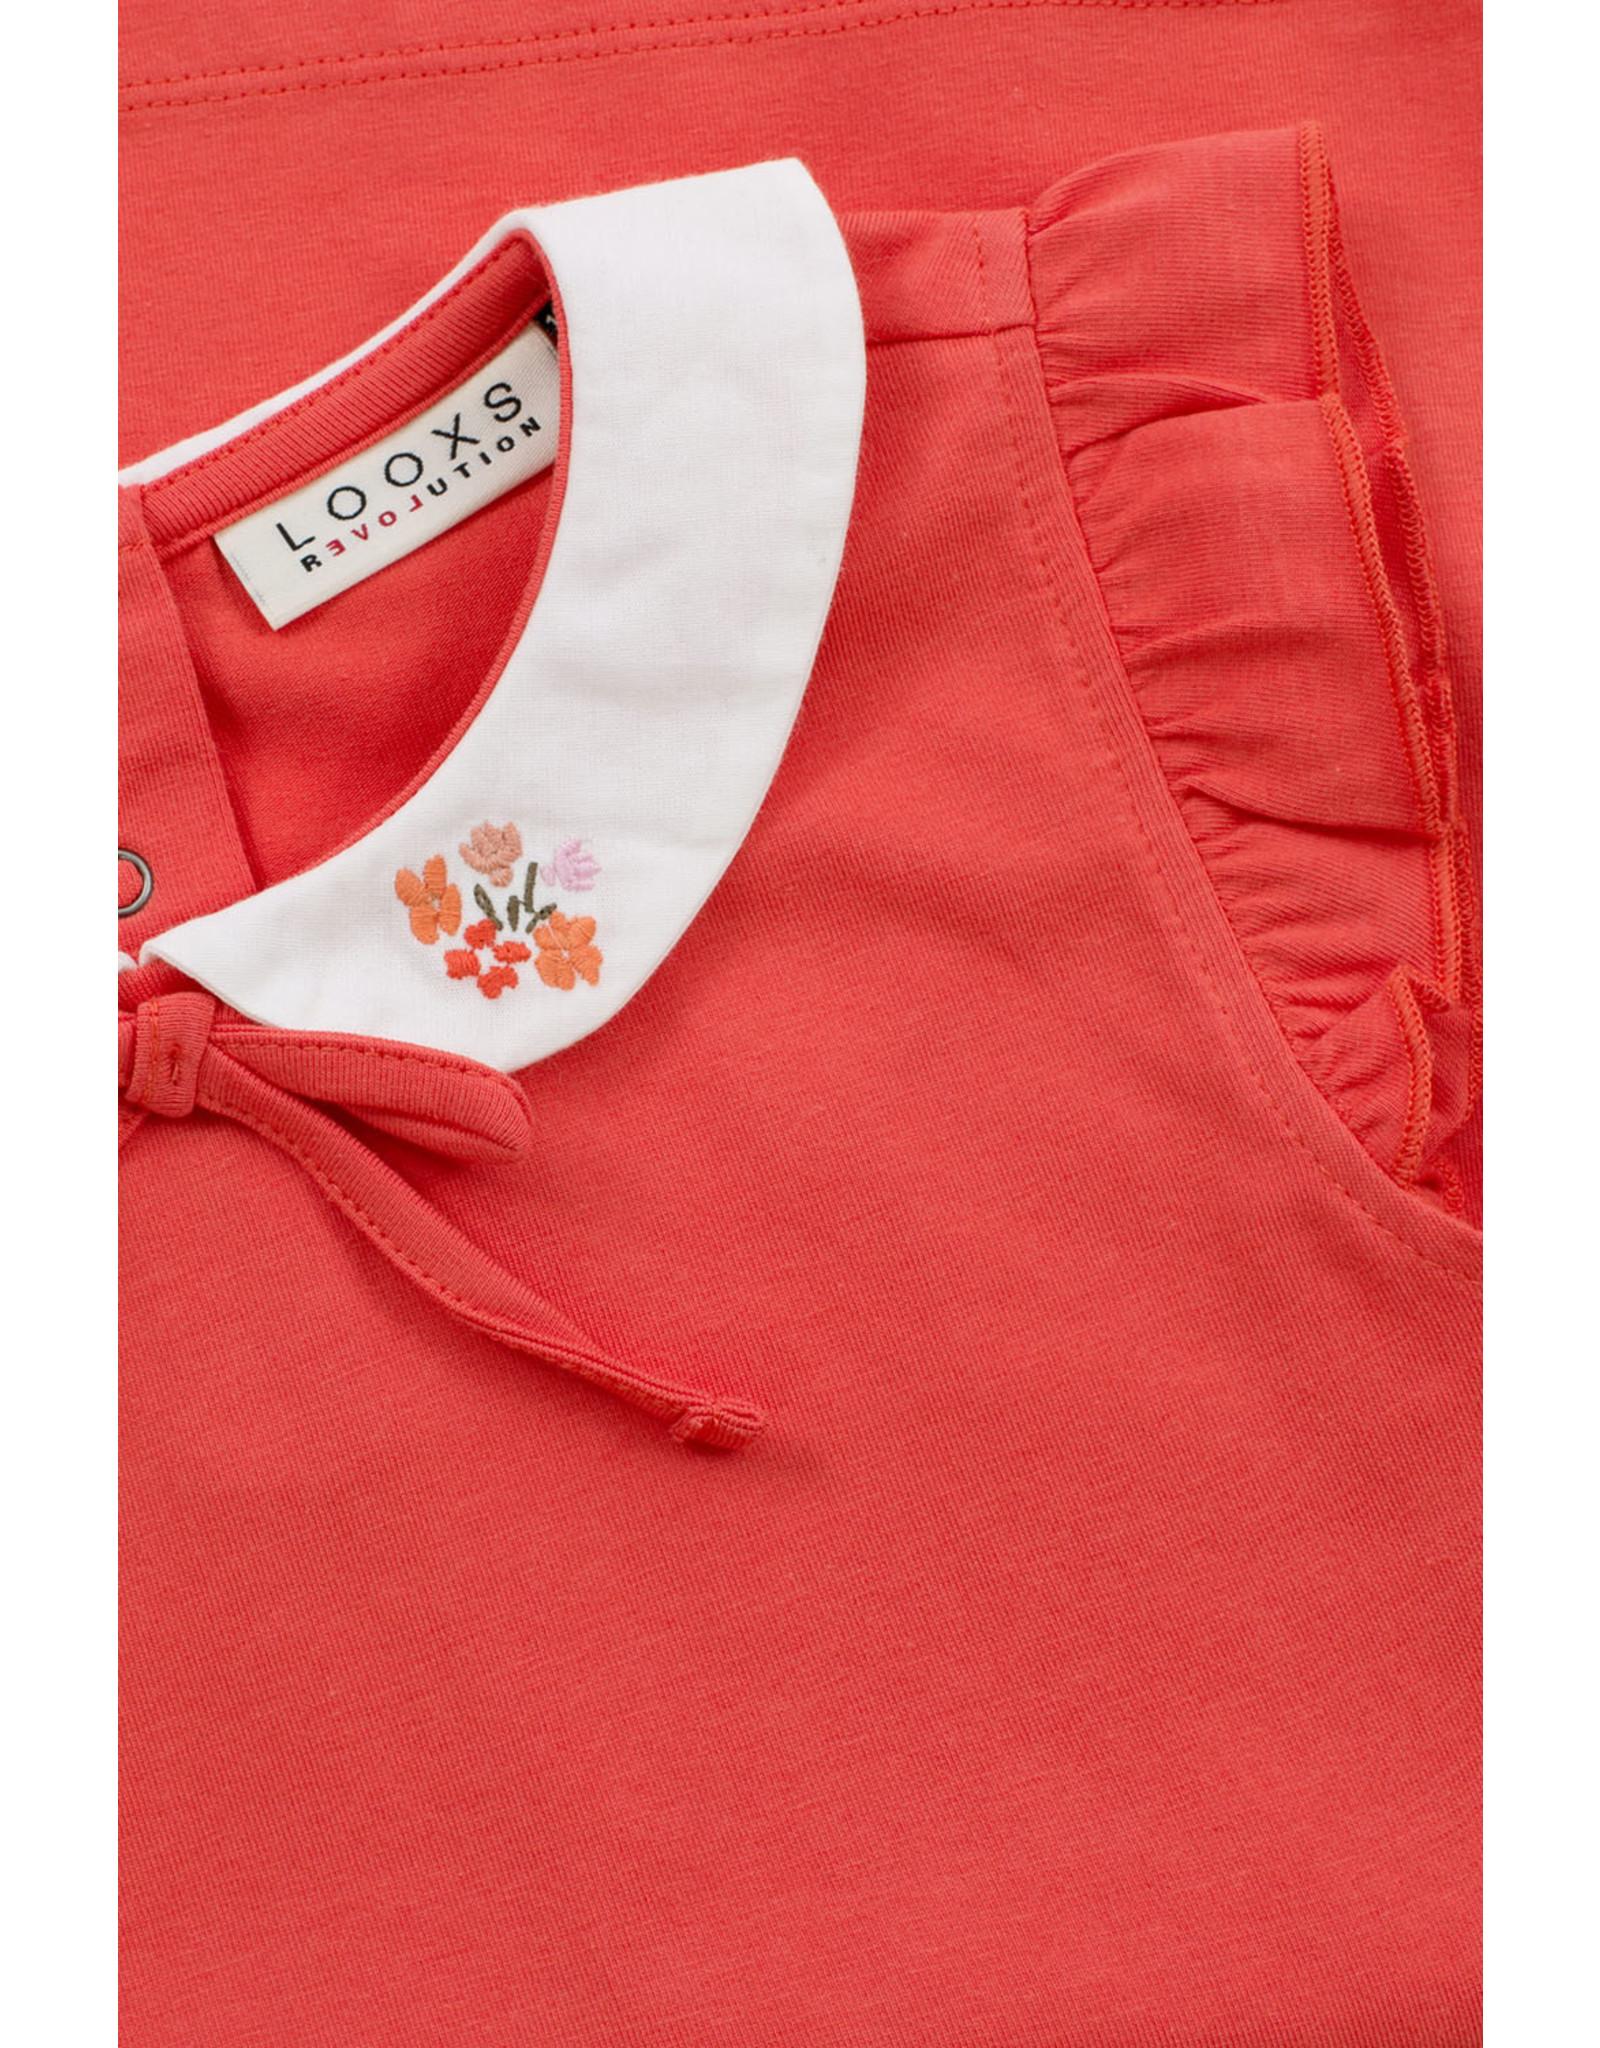 Looxs Little Little t-shirt coral